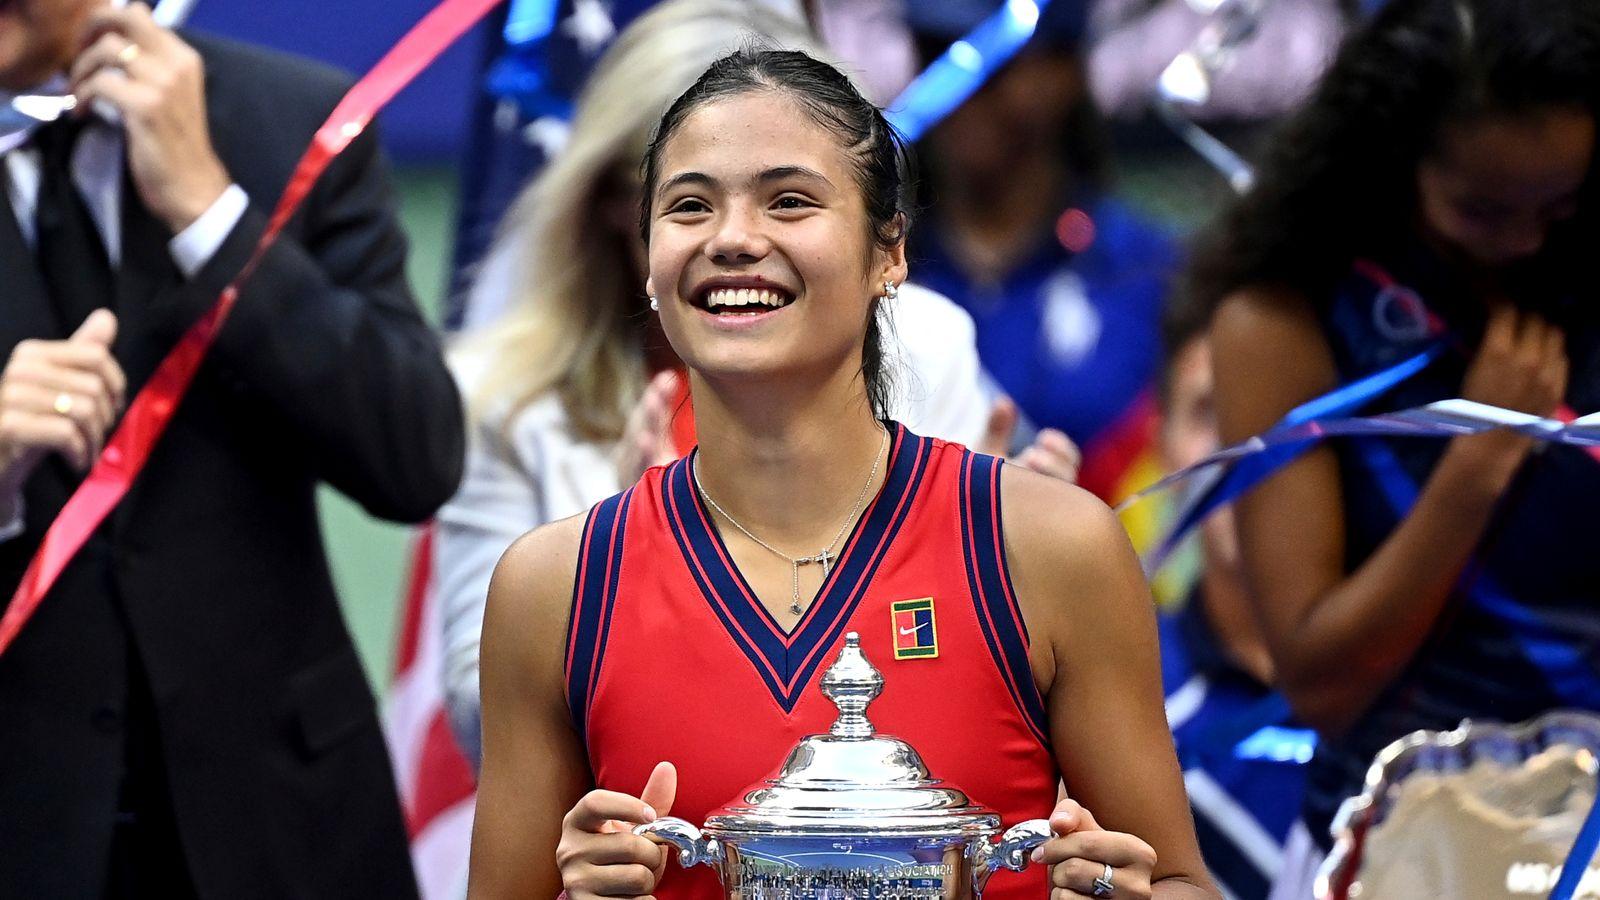 Emma Raducanu: Andy Murray says British tennis must build on teenager's US Open win